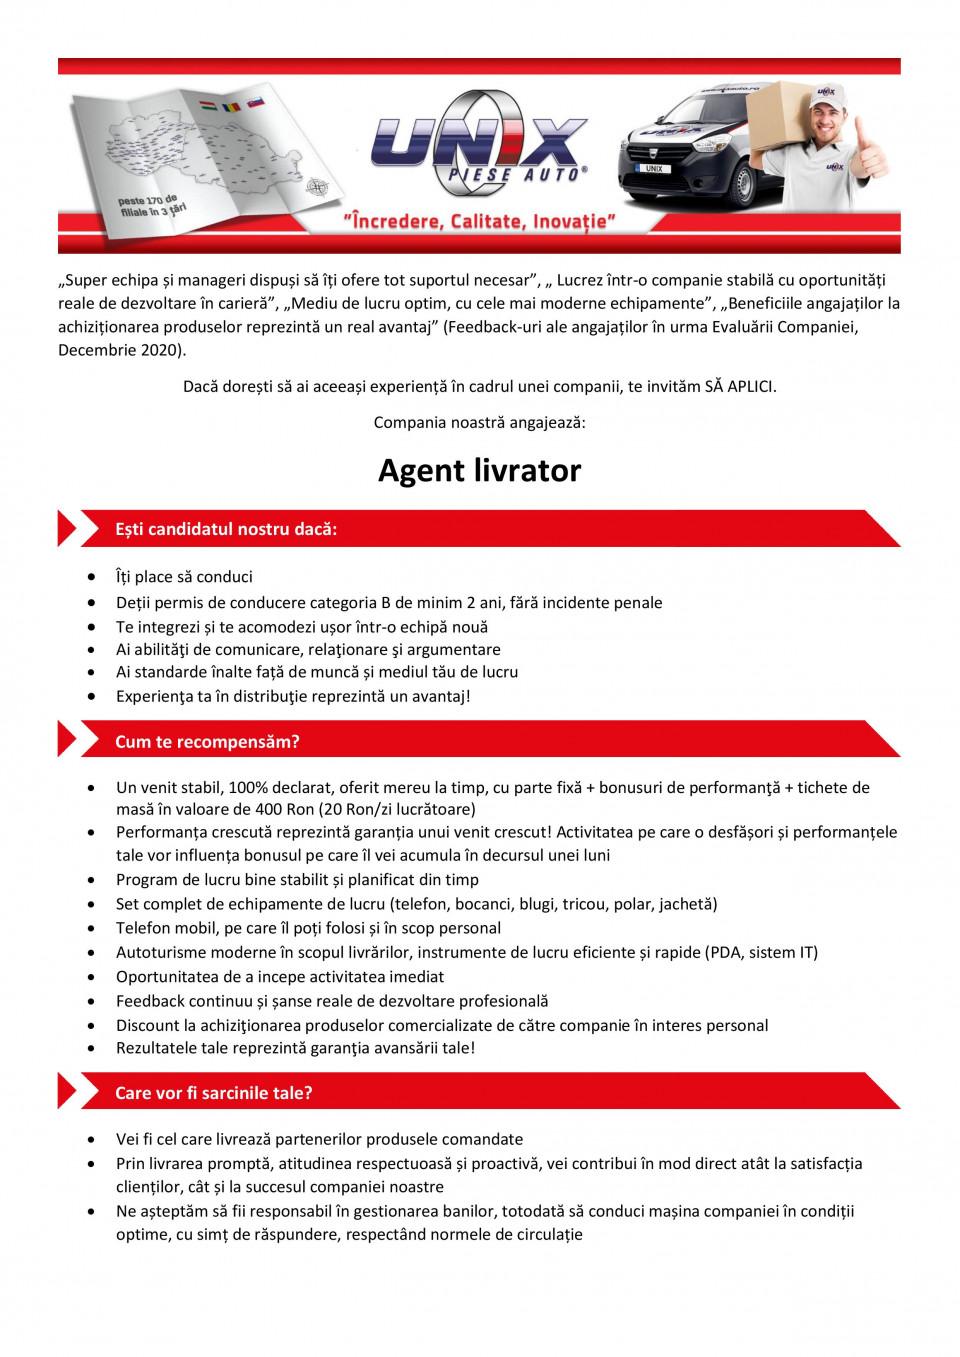 Agent livrator   Incredere, Calitate, Inovaţie